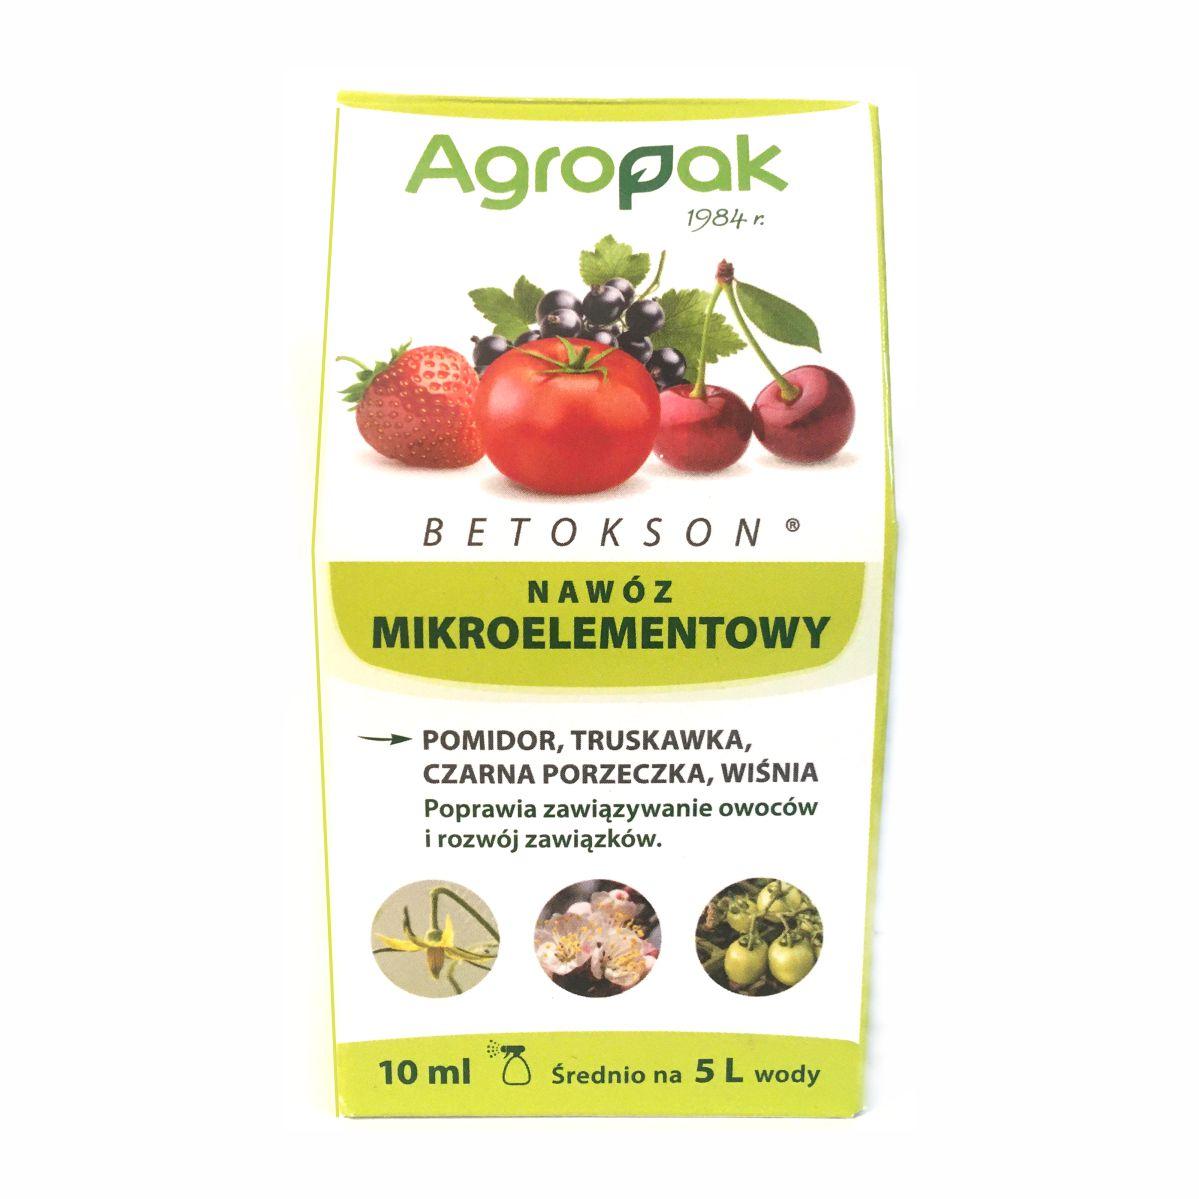 Betokson 10ml nawóz mikroelementowy Agropak